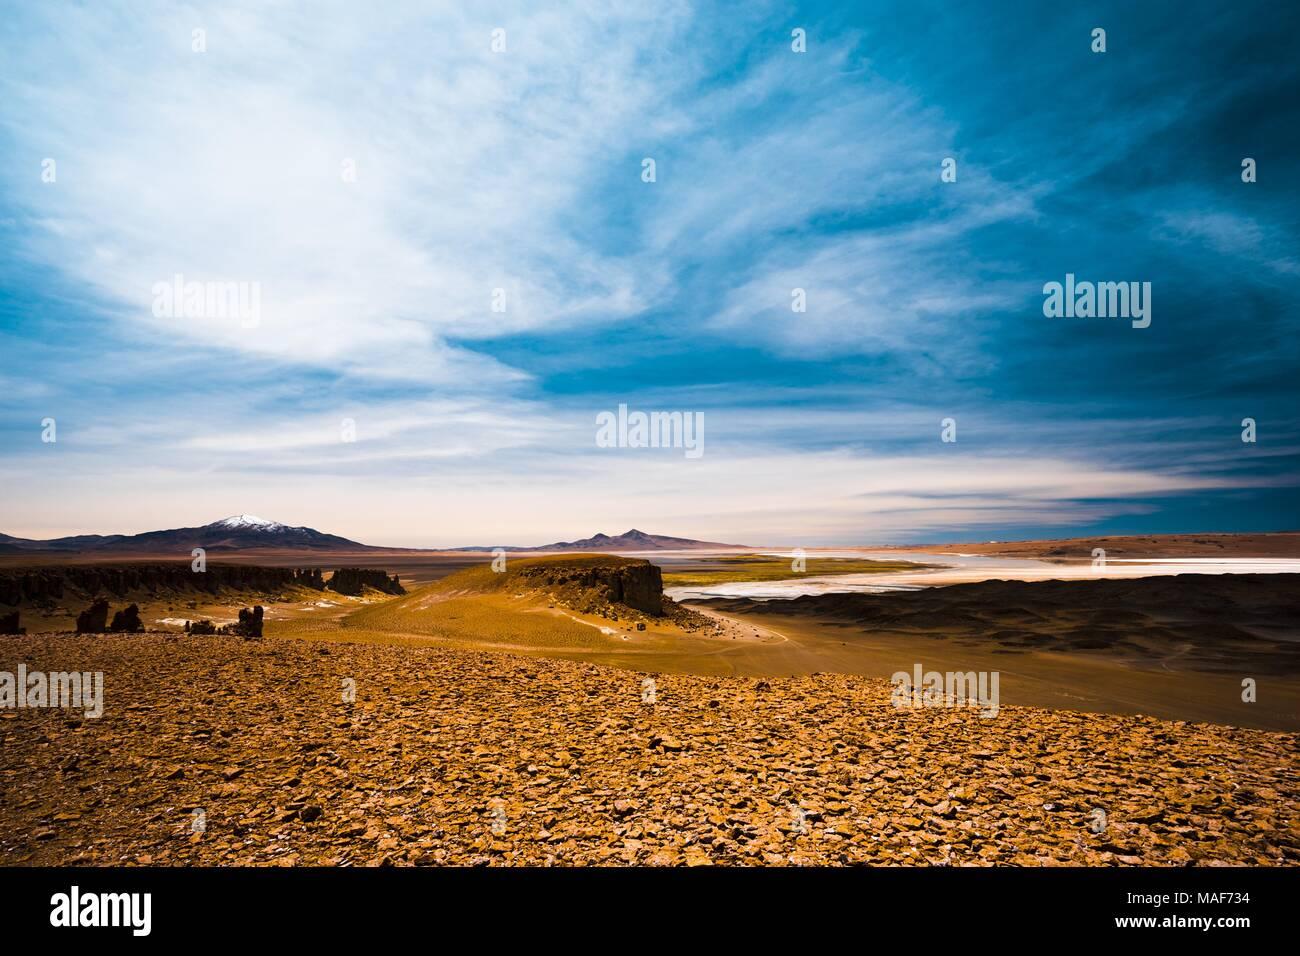 Salar de Tara in Chile, ein tyical Altiplano salt lake in der trockenen Atacama Region Stockbild